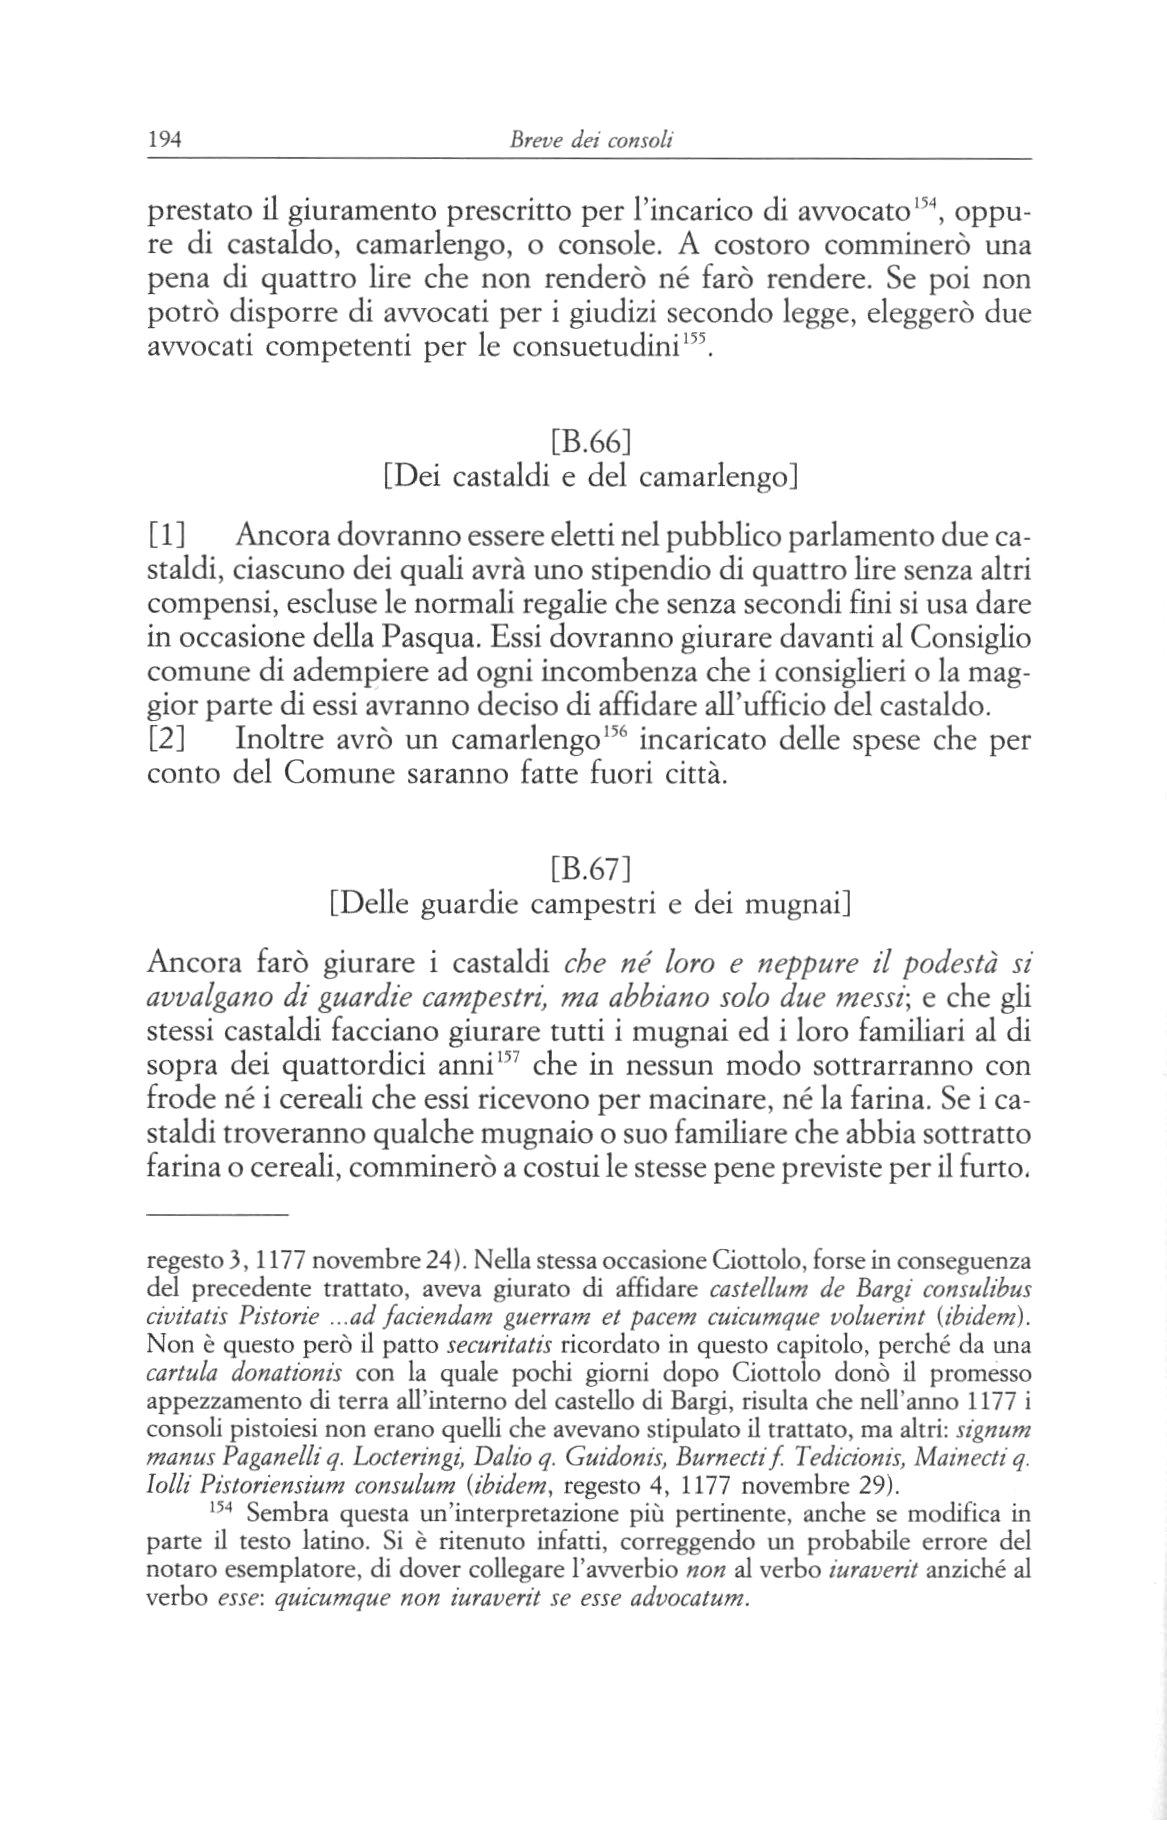 statuti pistoiesi del sec.XII 0194.jpg